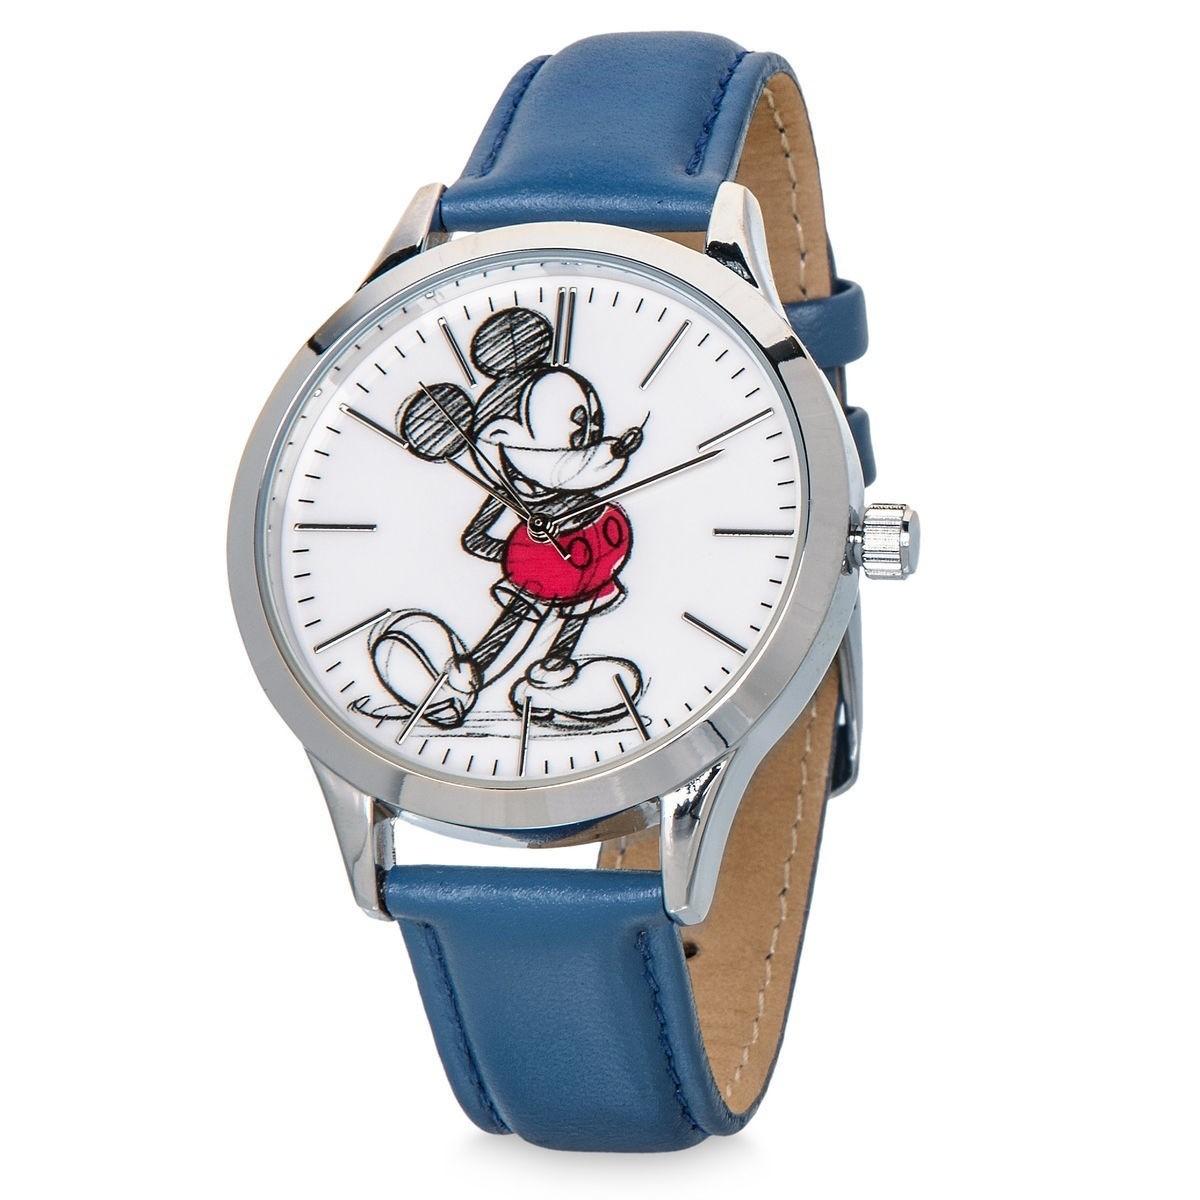 Reloj Mickey Mouse Limitado